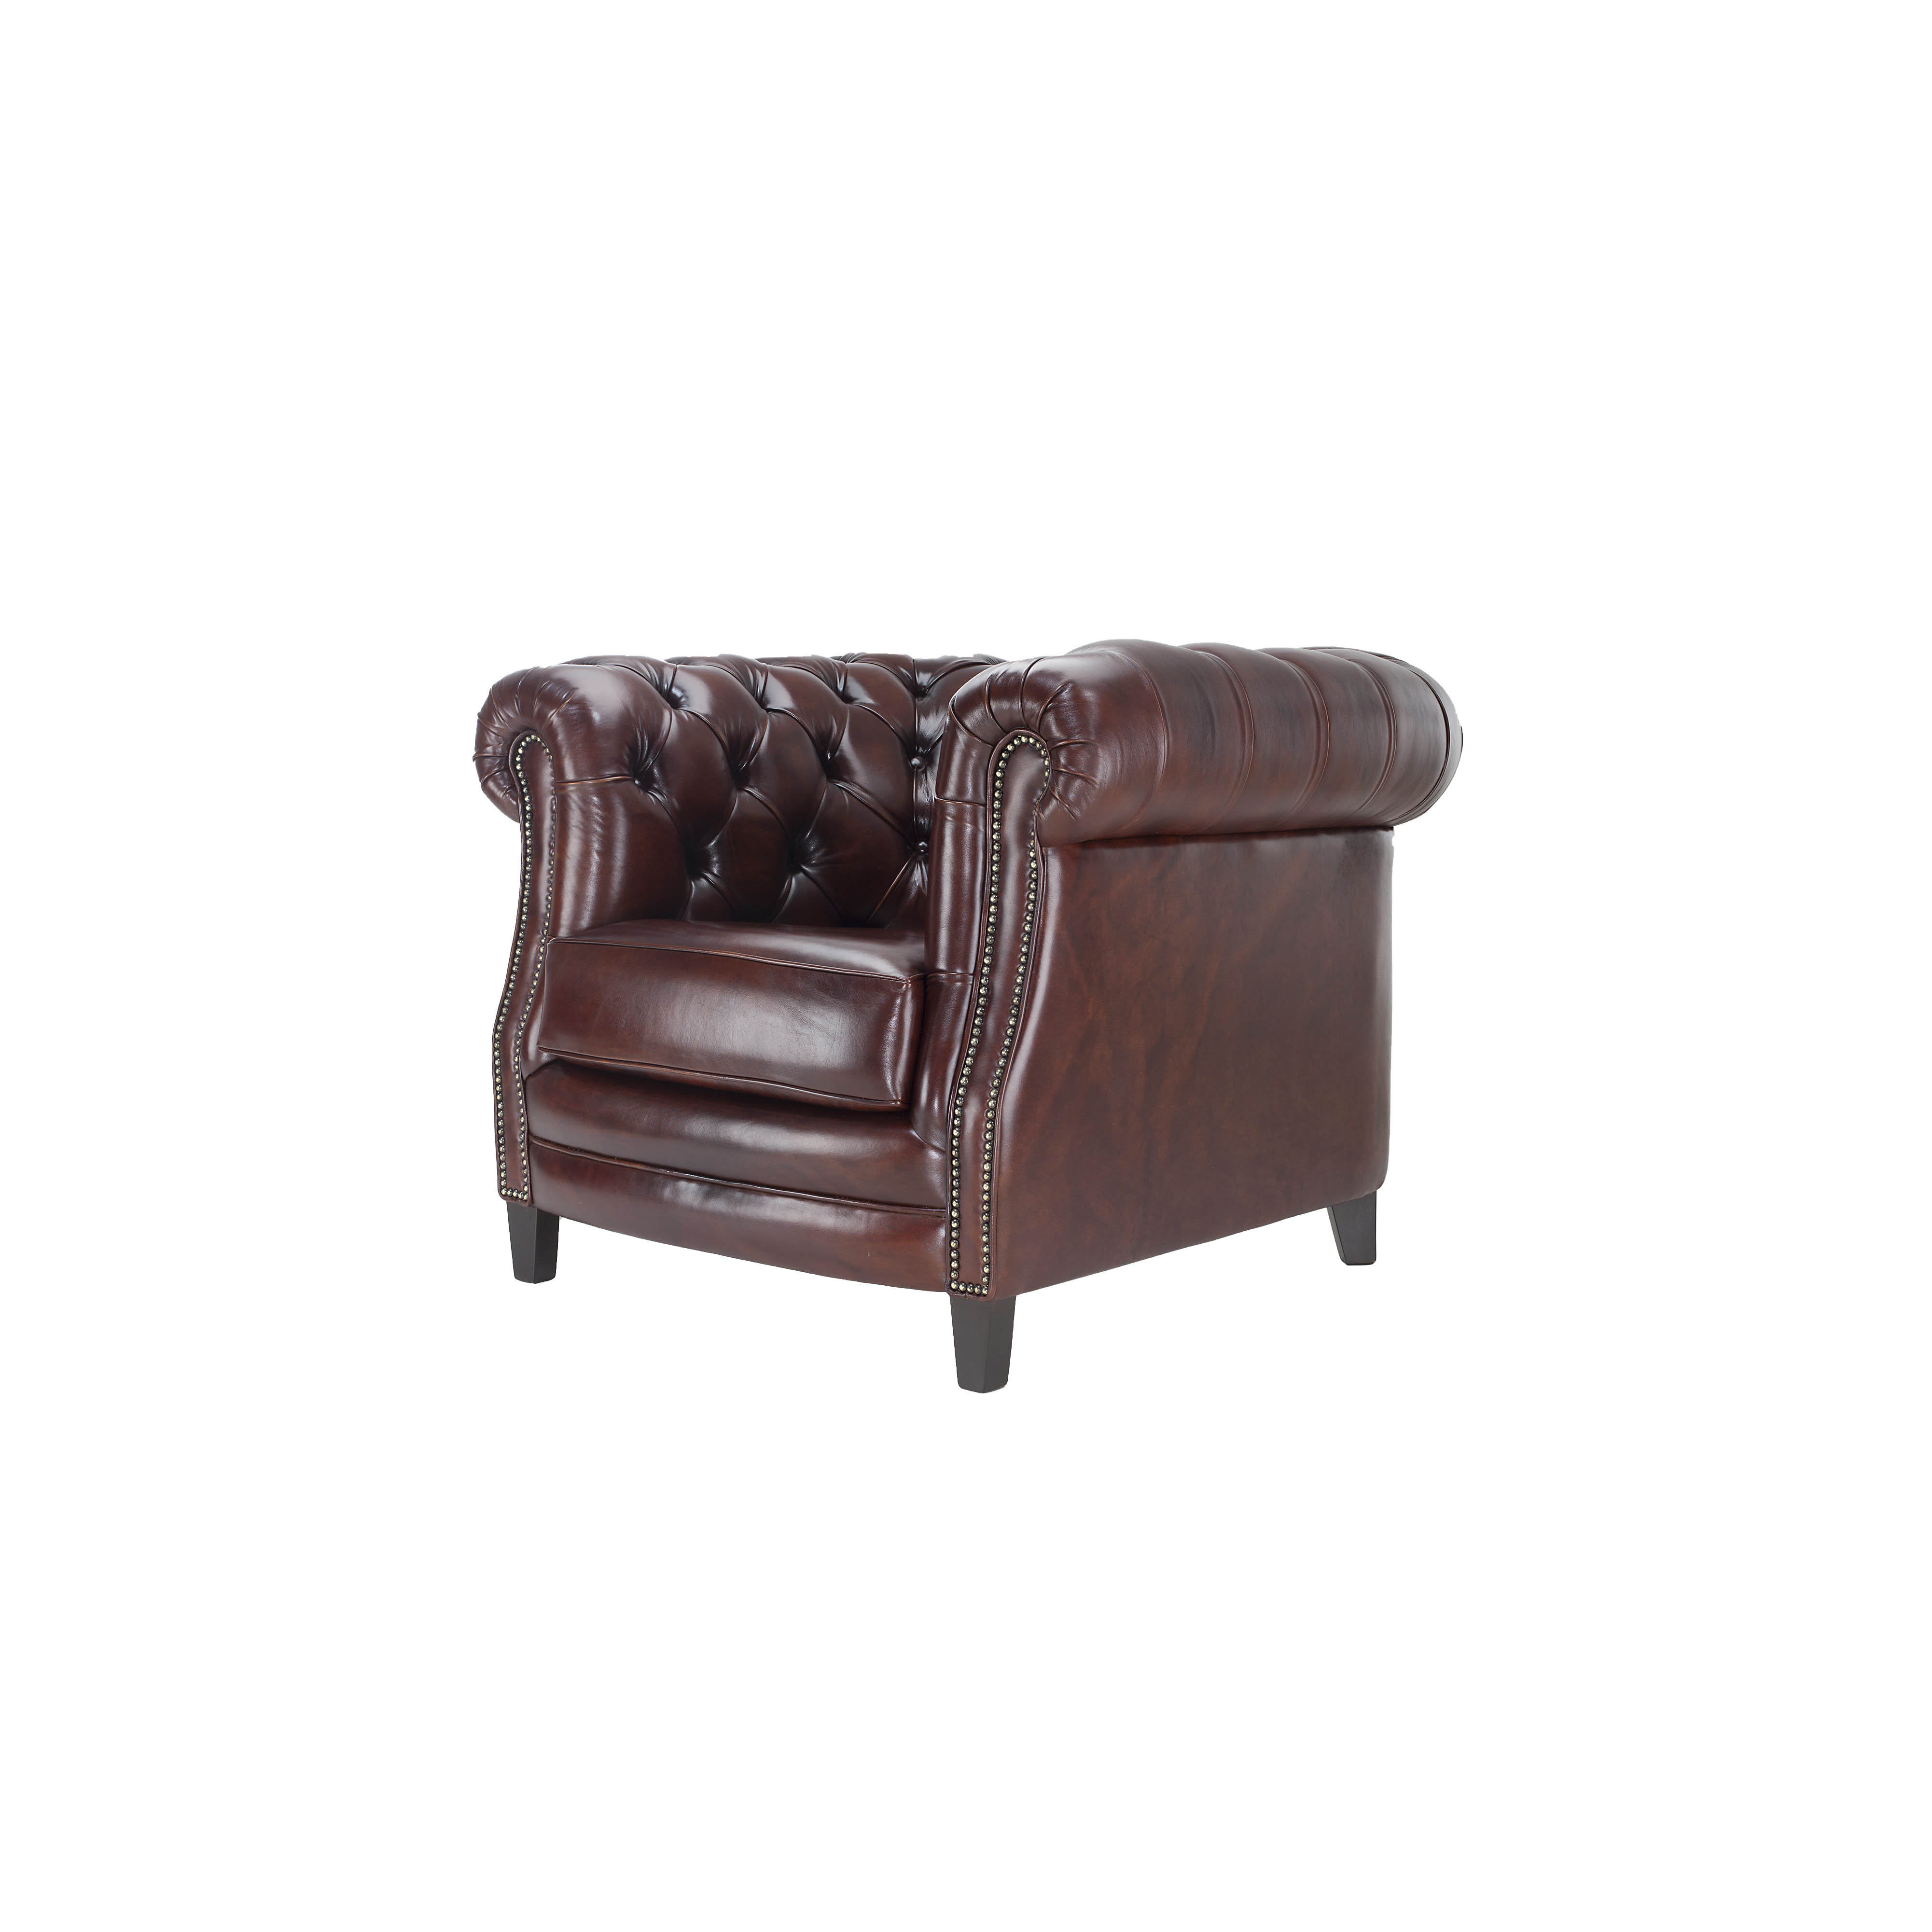 Knight armchair